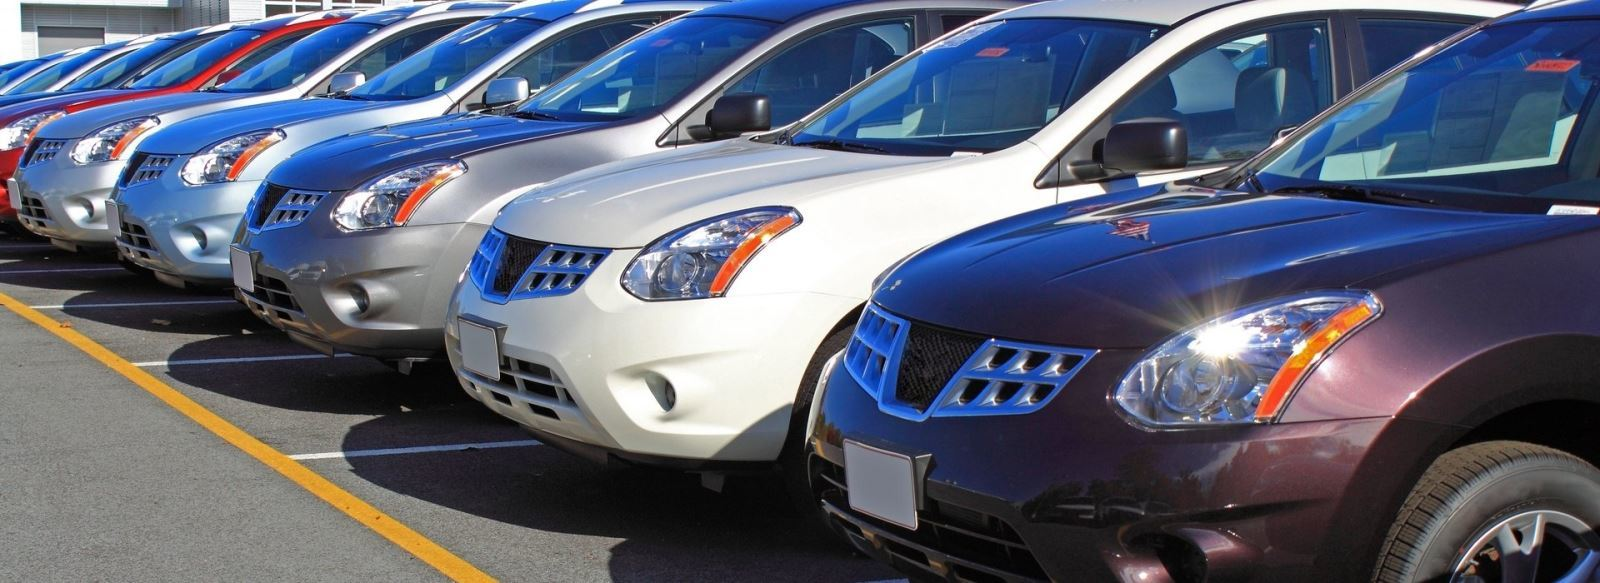 Car rental market in Vietnam is growing